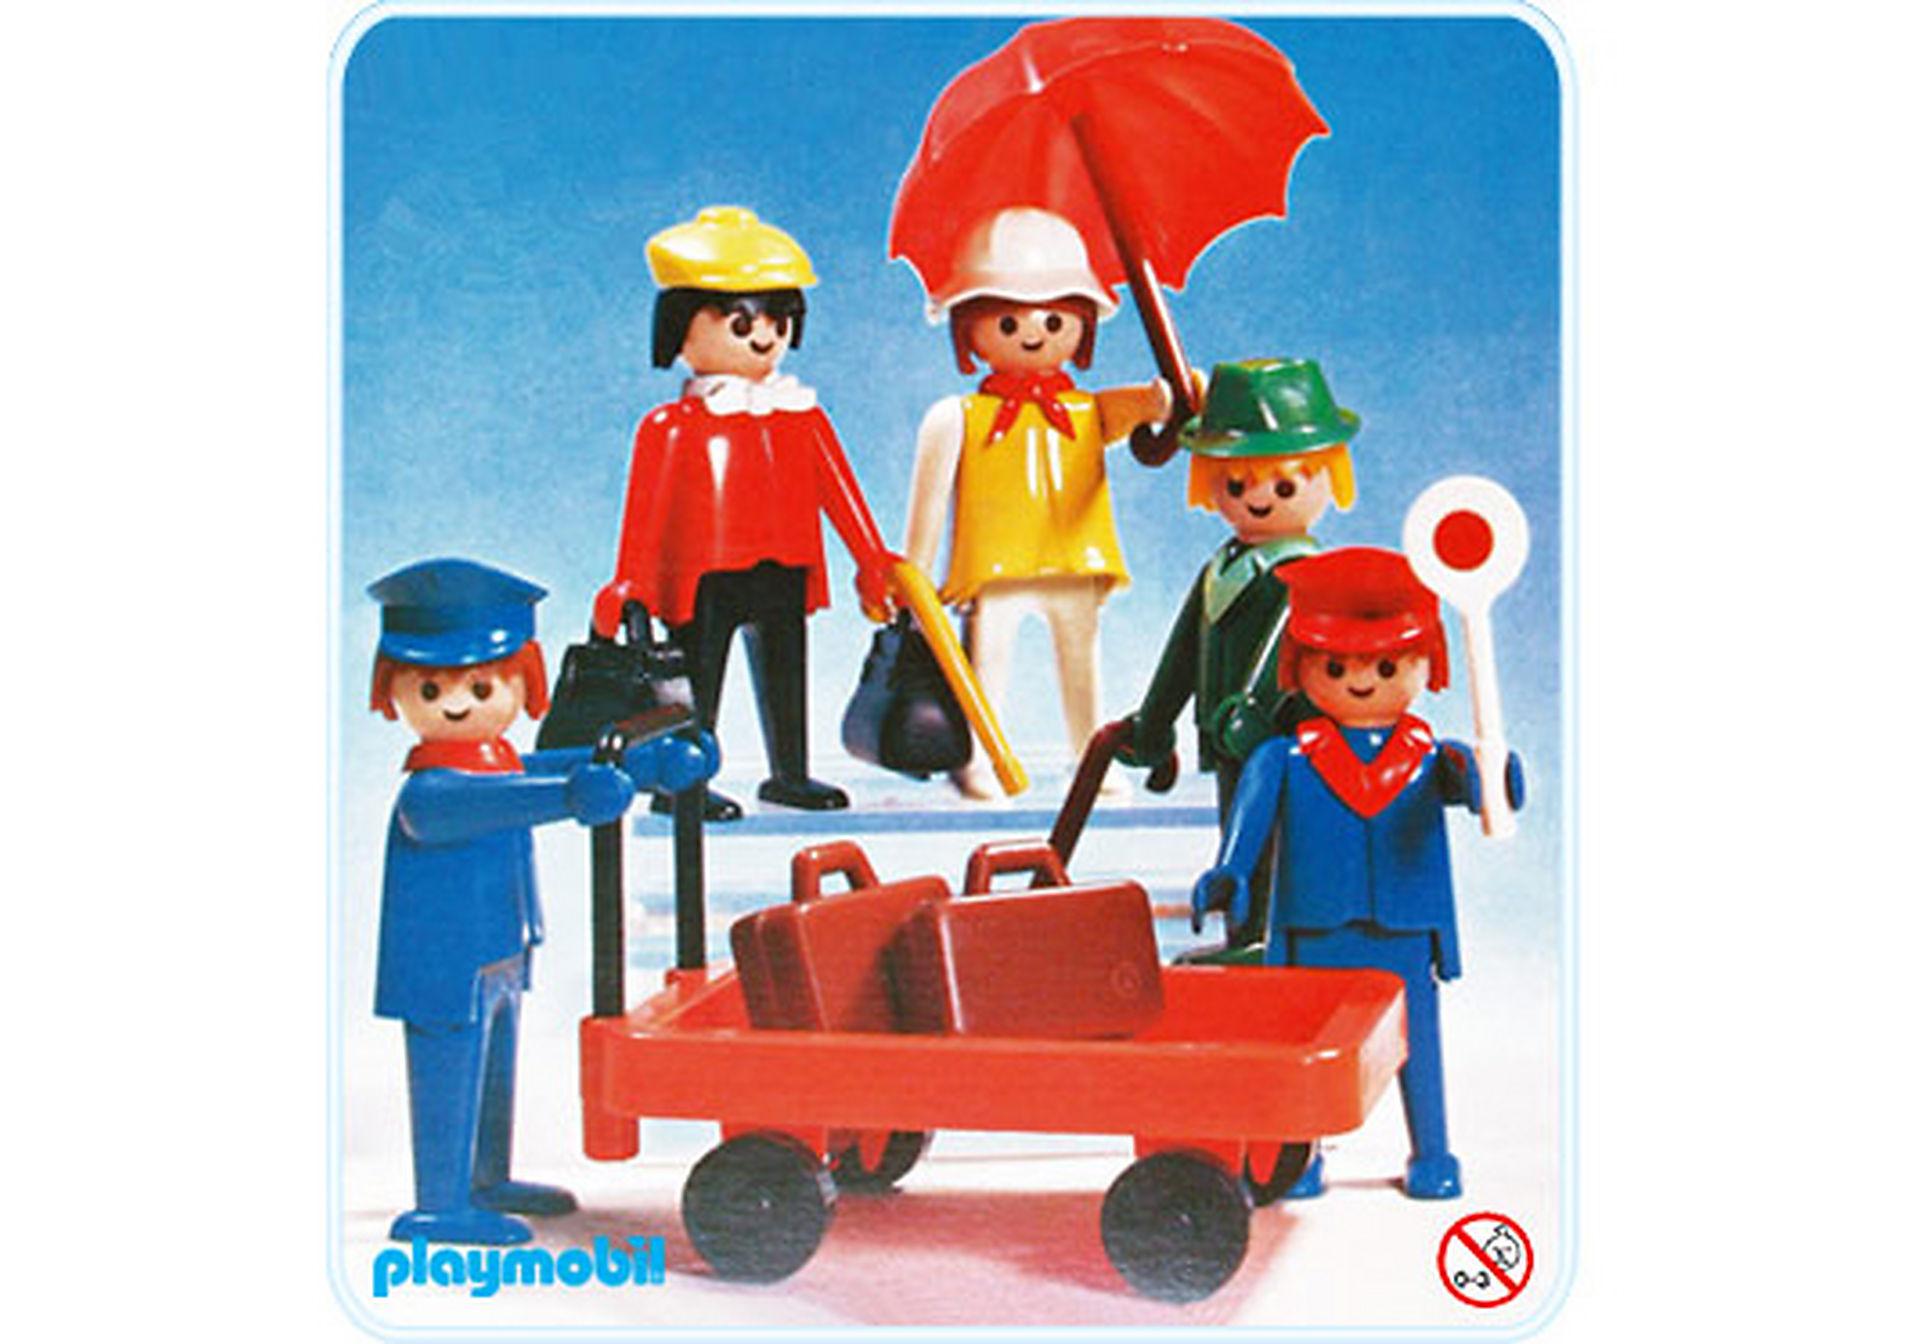 http://media.playmobil.com/i/playmobil/3271-B_product_detail/Set Voyageurs